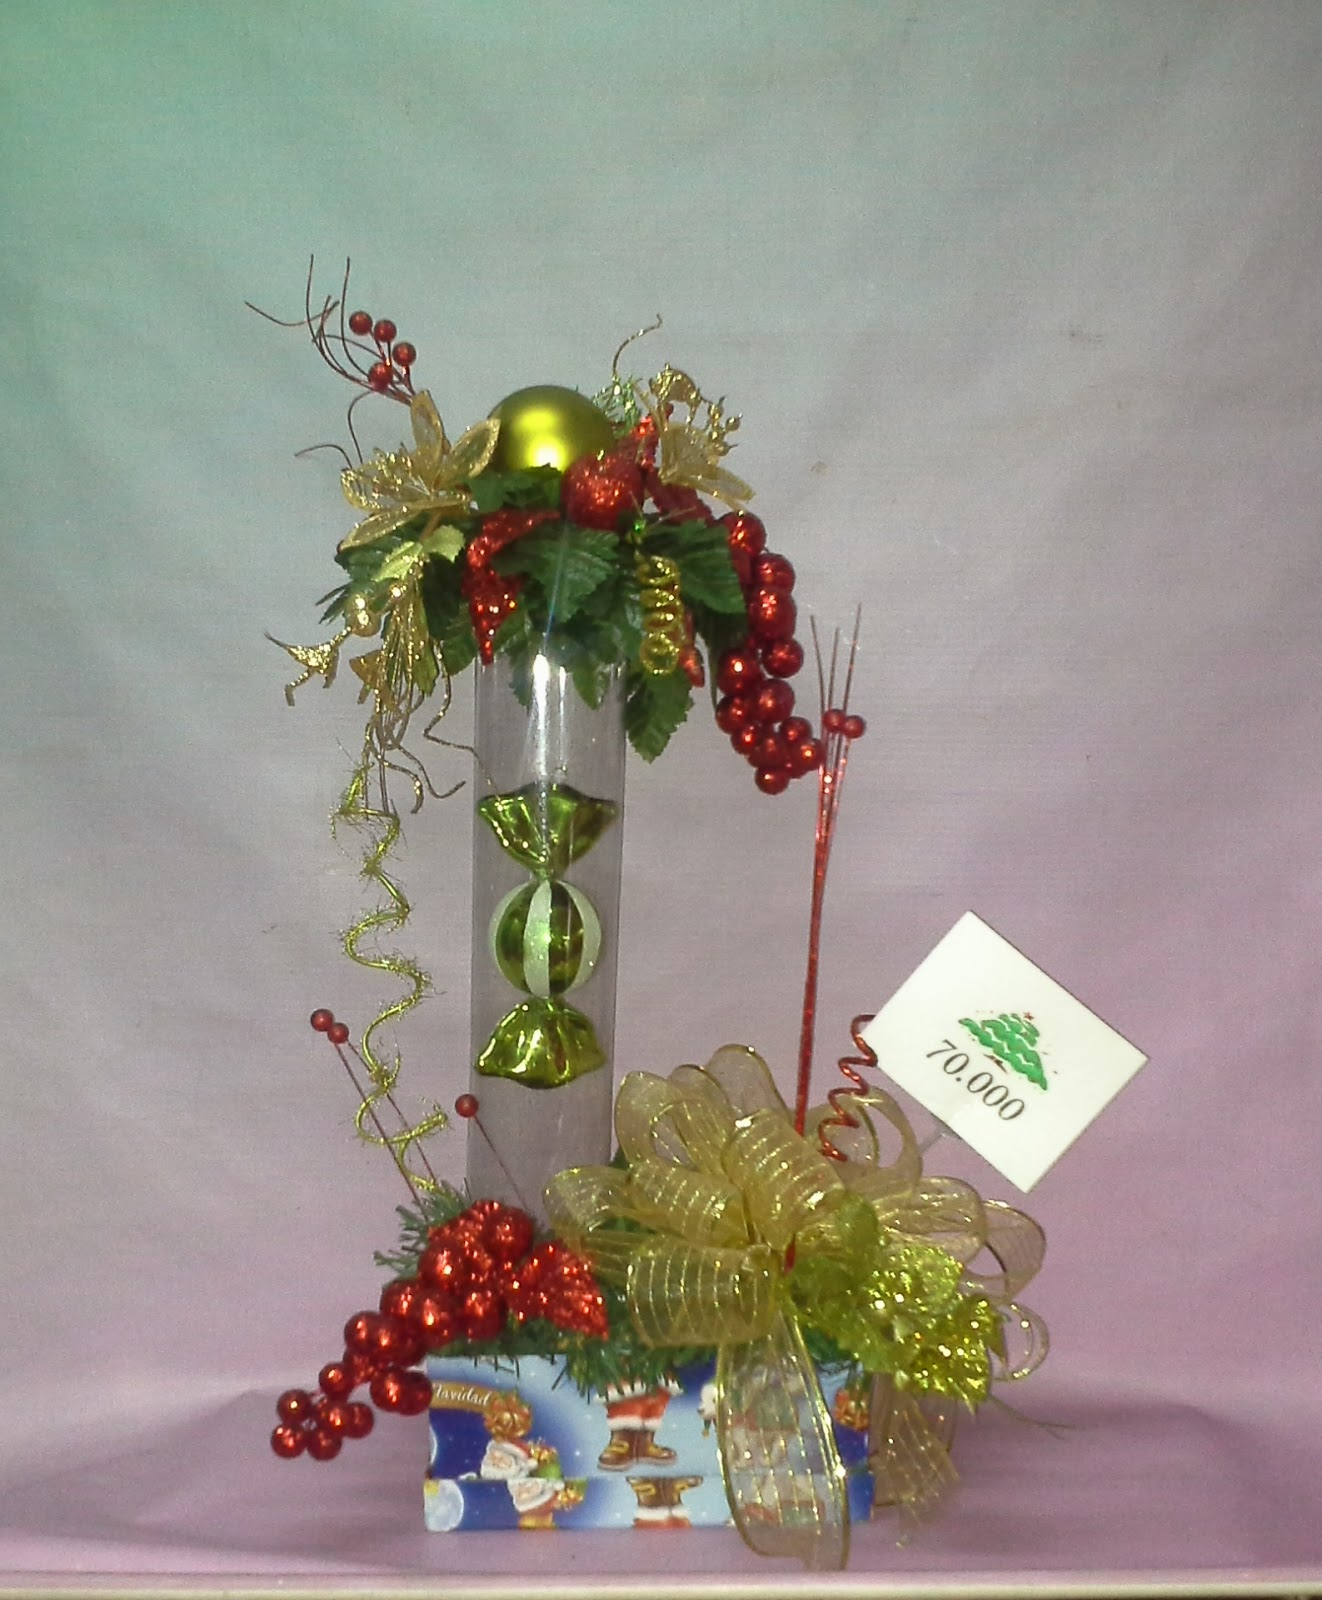 Florister a hojas blancas arreglos navide os for Arreglo para puertas de navidad